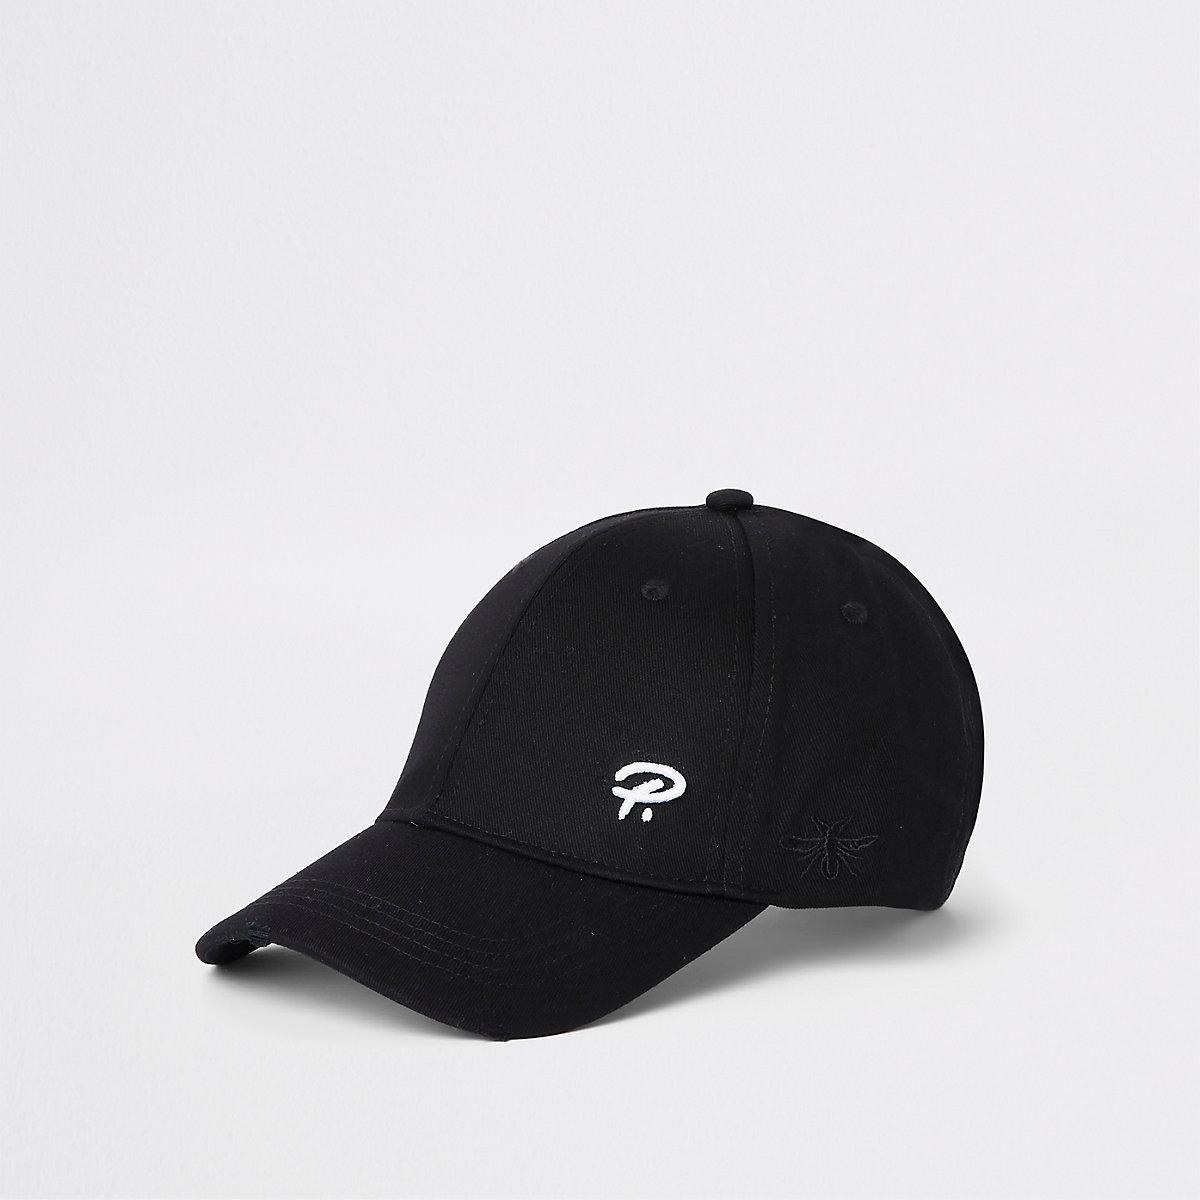 Black 'Prolific' wasp embroidery baseball cap